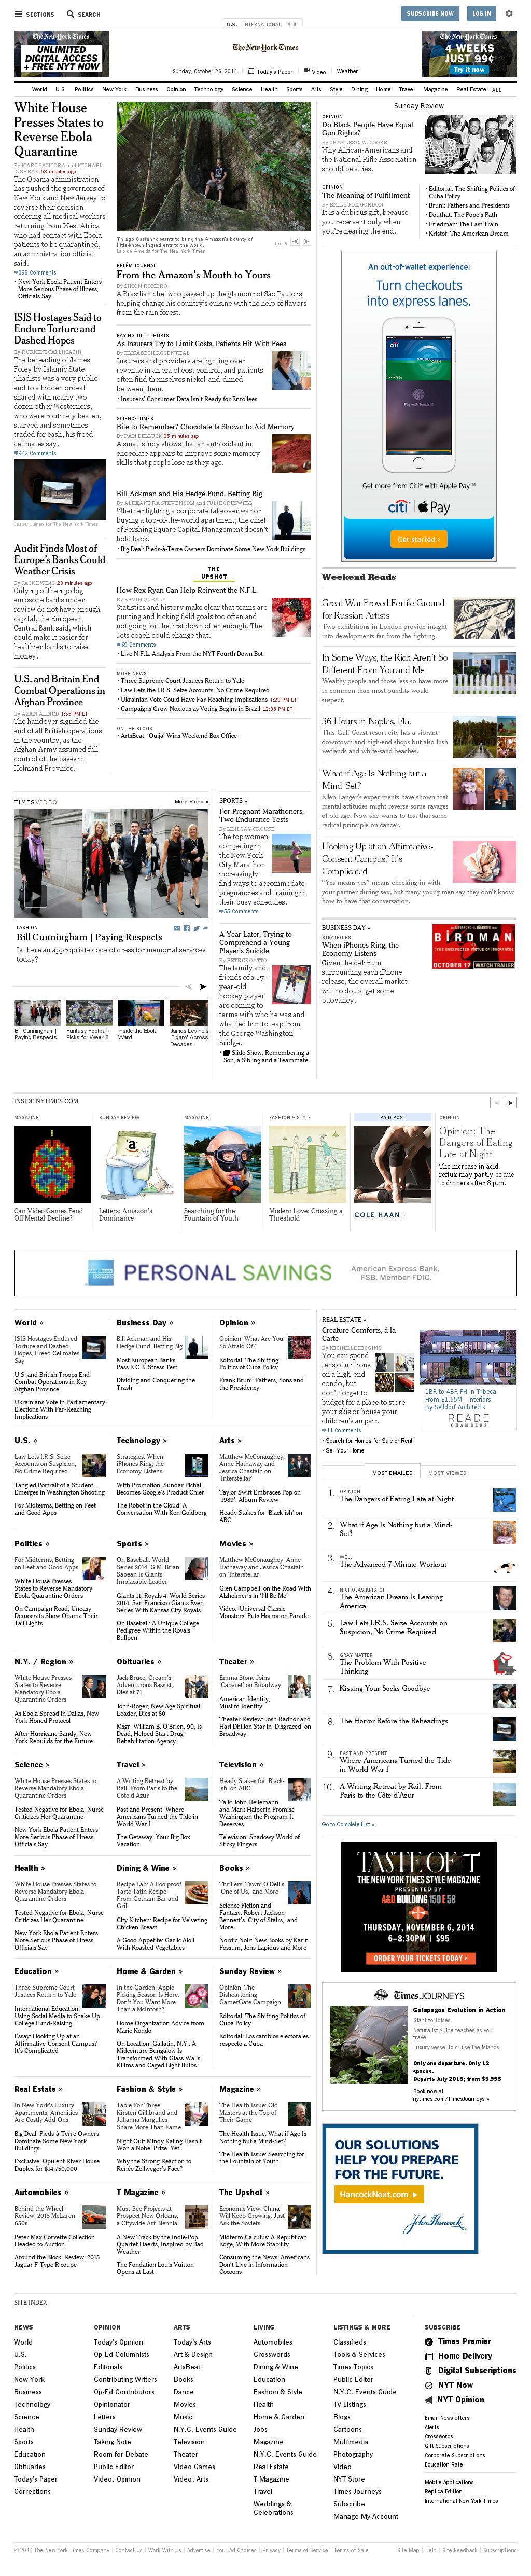 The New York Times at Sunday Oct. 26, 2014, 8:10 p.m. UTC